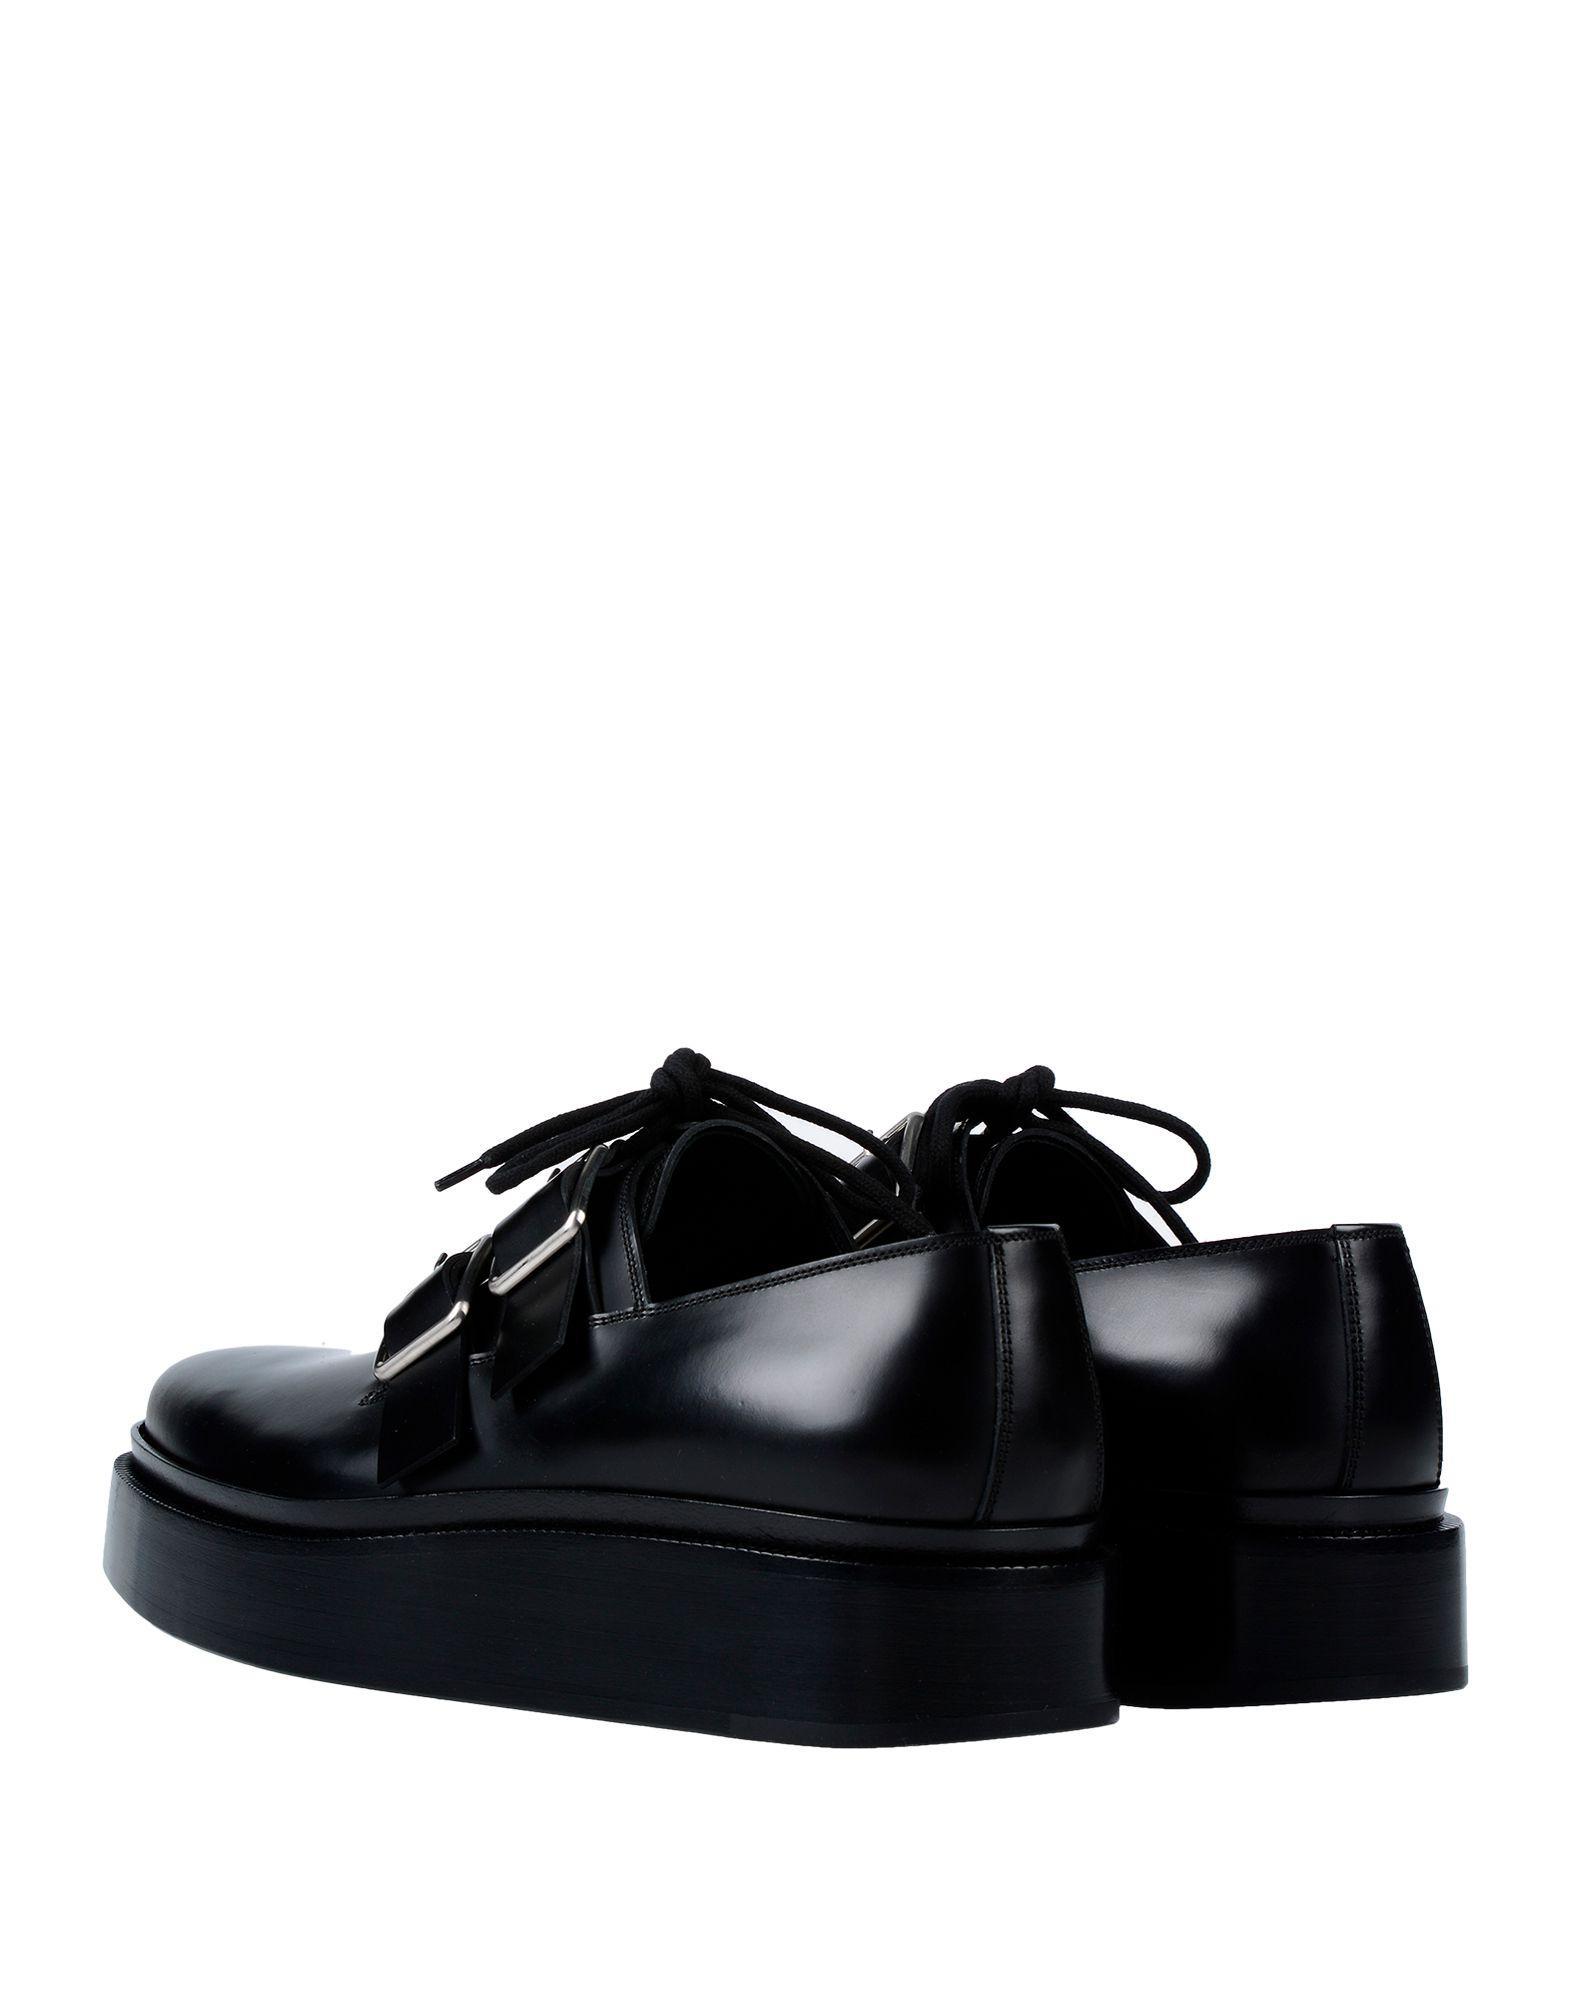 20a59499398 Lyst - Jil Sander Lace-up Shoe in Black for Men